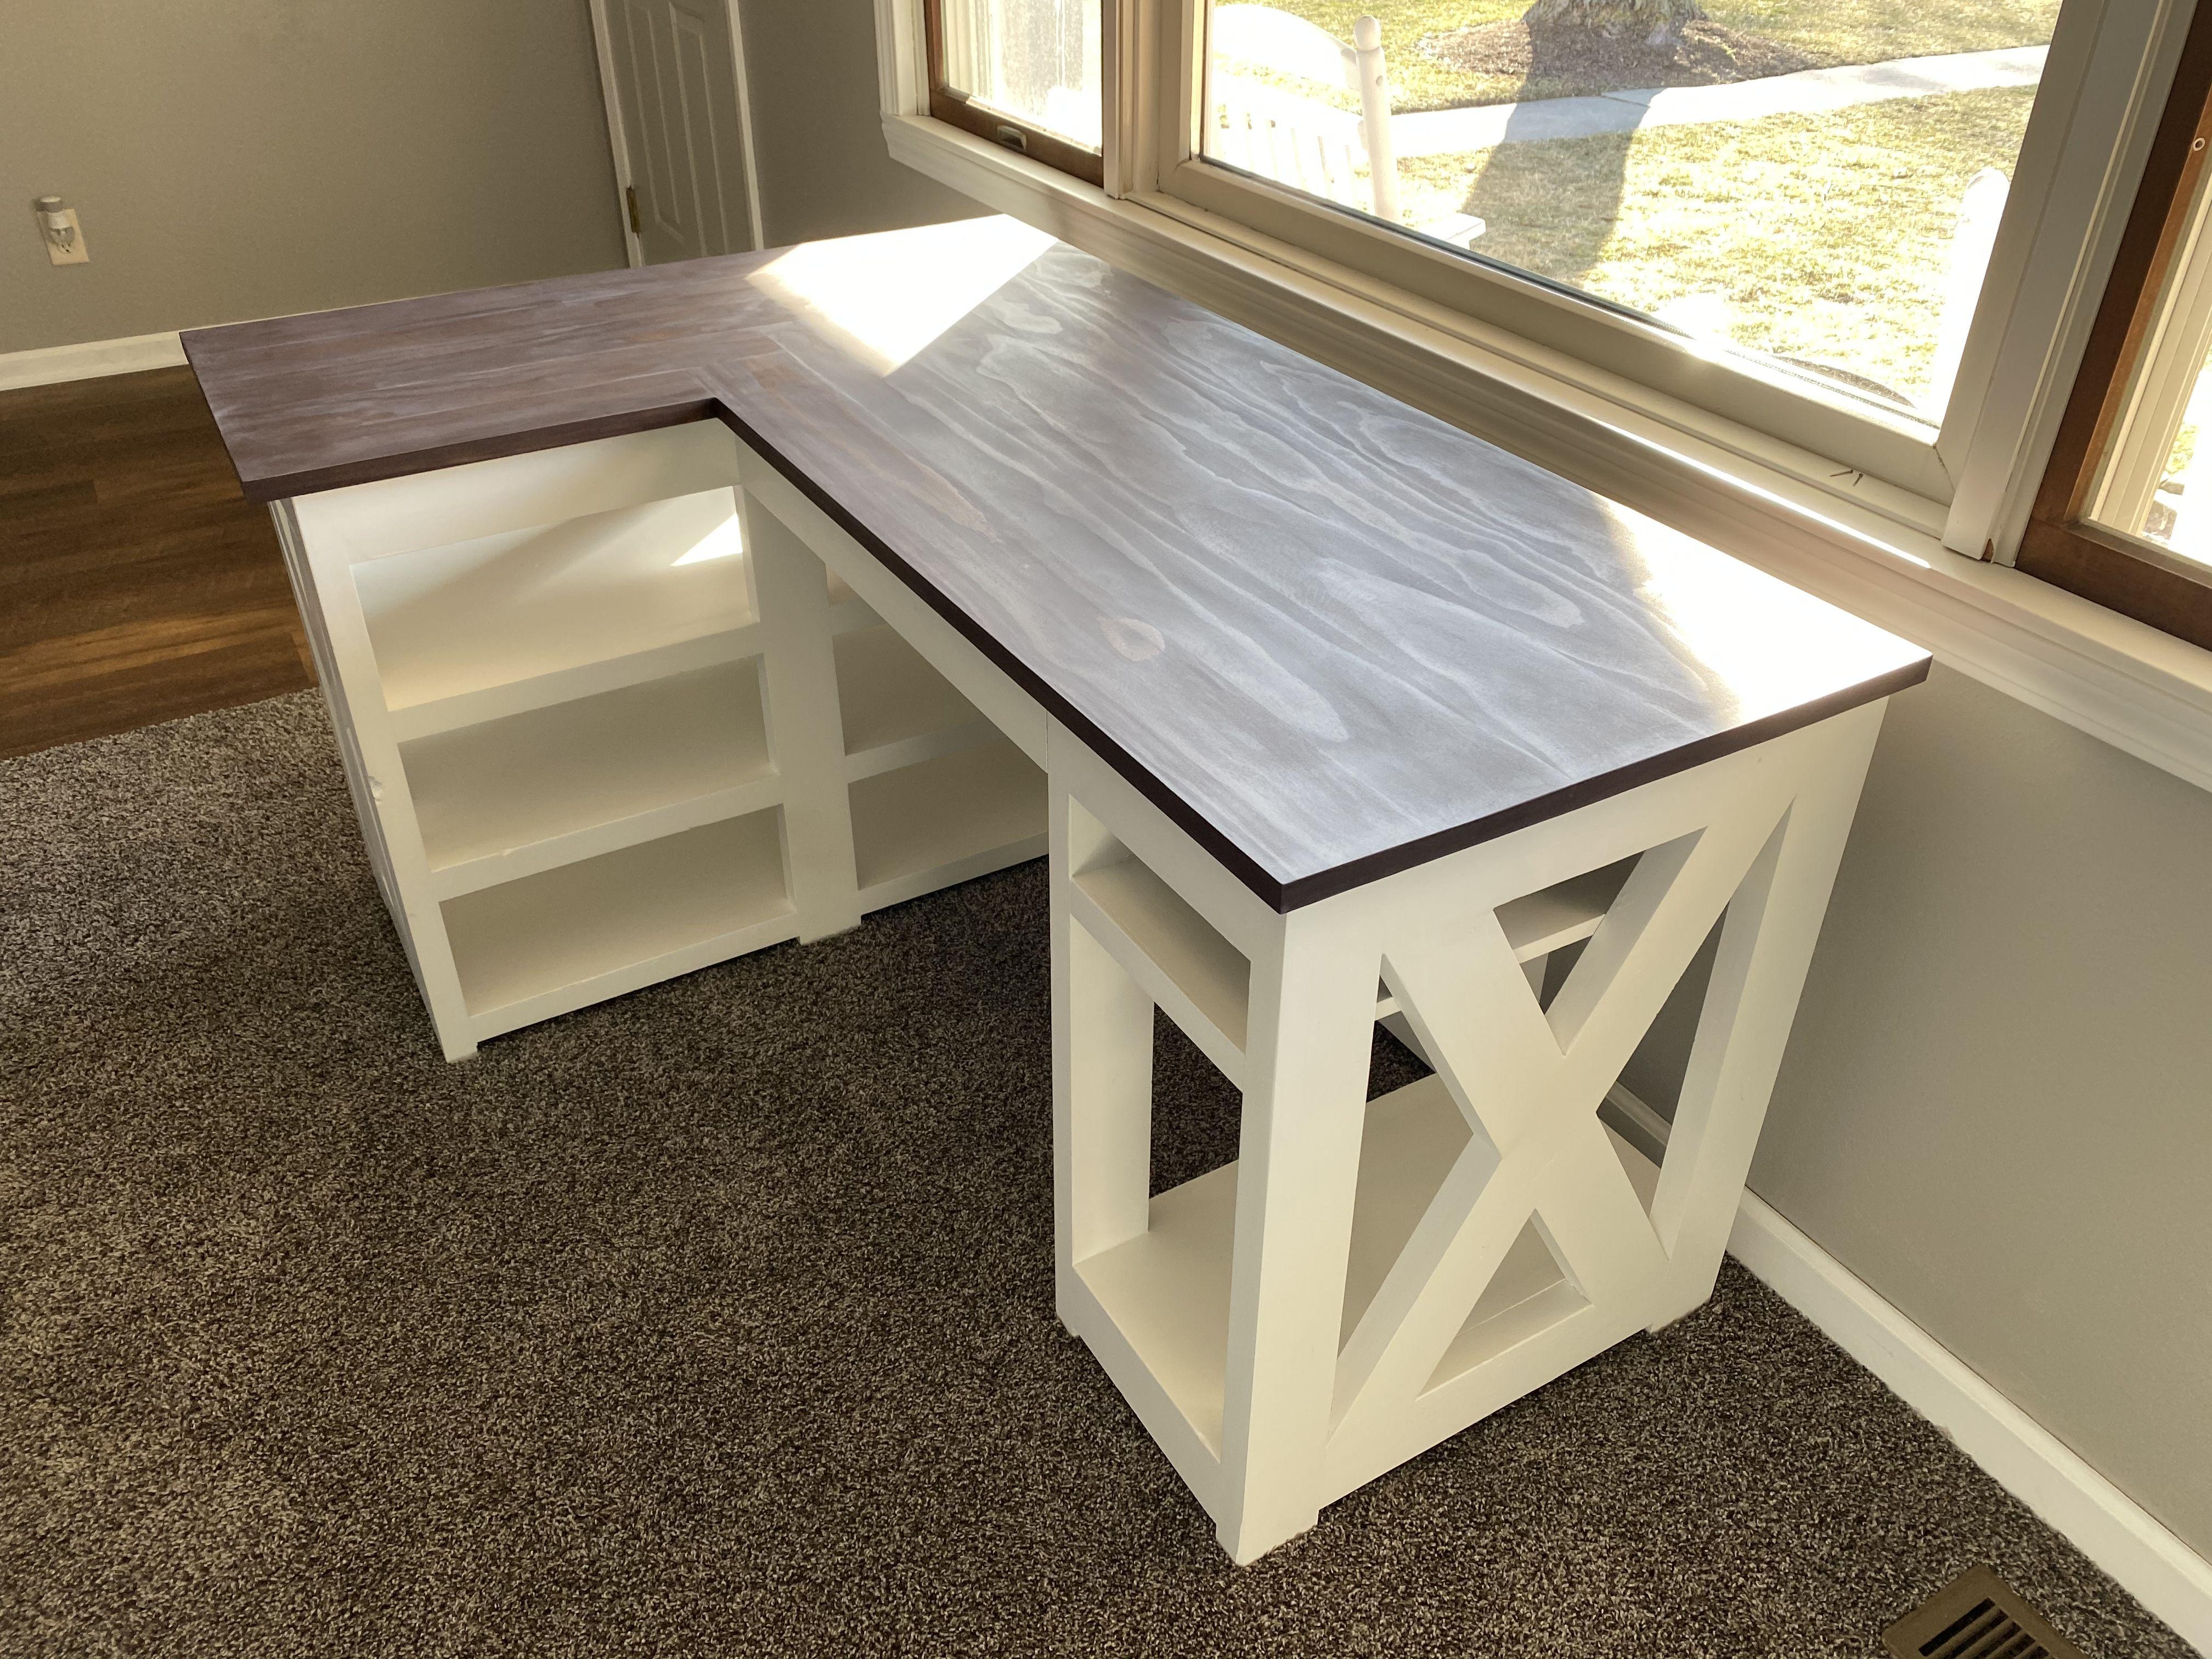 Farmhouse L Desk In 2020 Diy Desk Plans L Shape Desk Diy Diy Office Desk